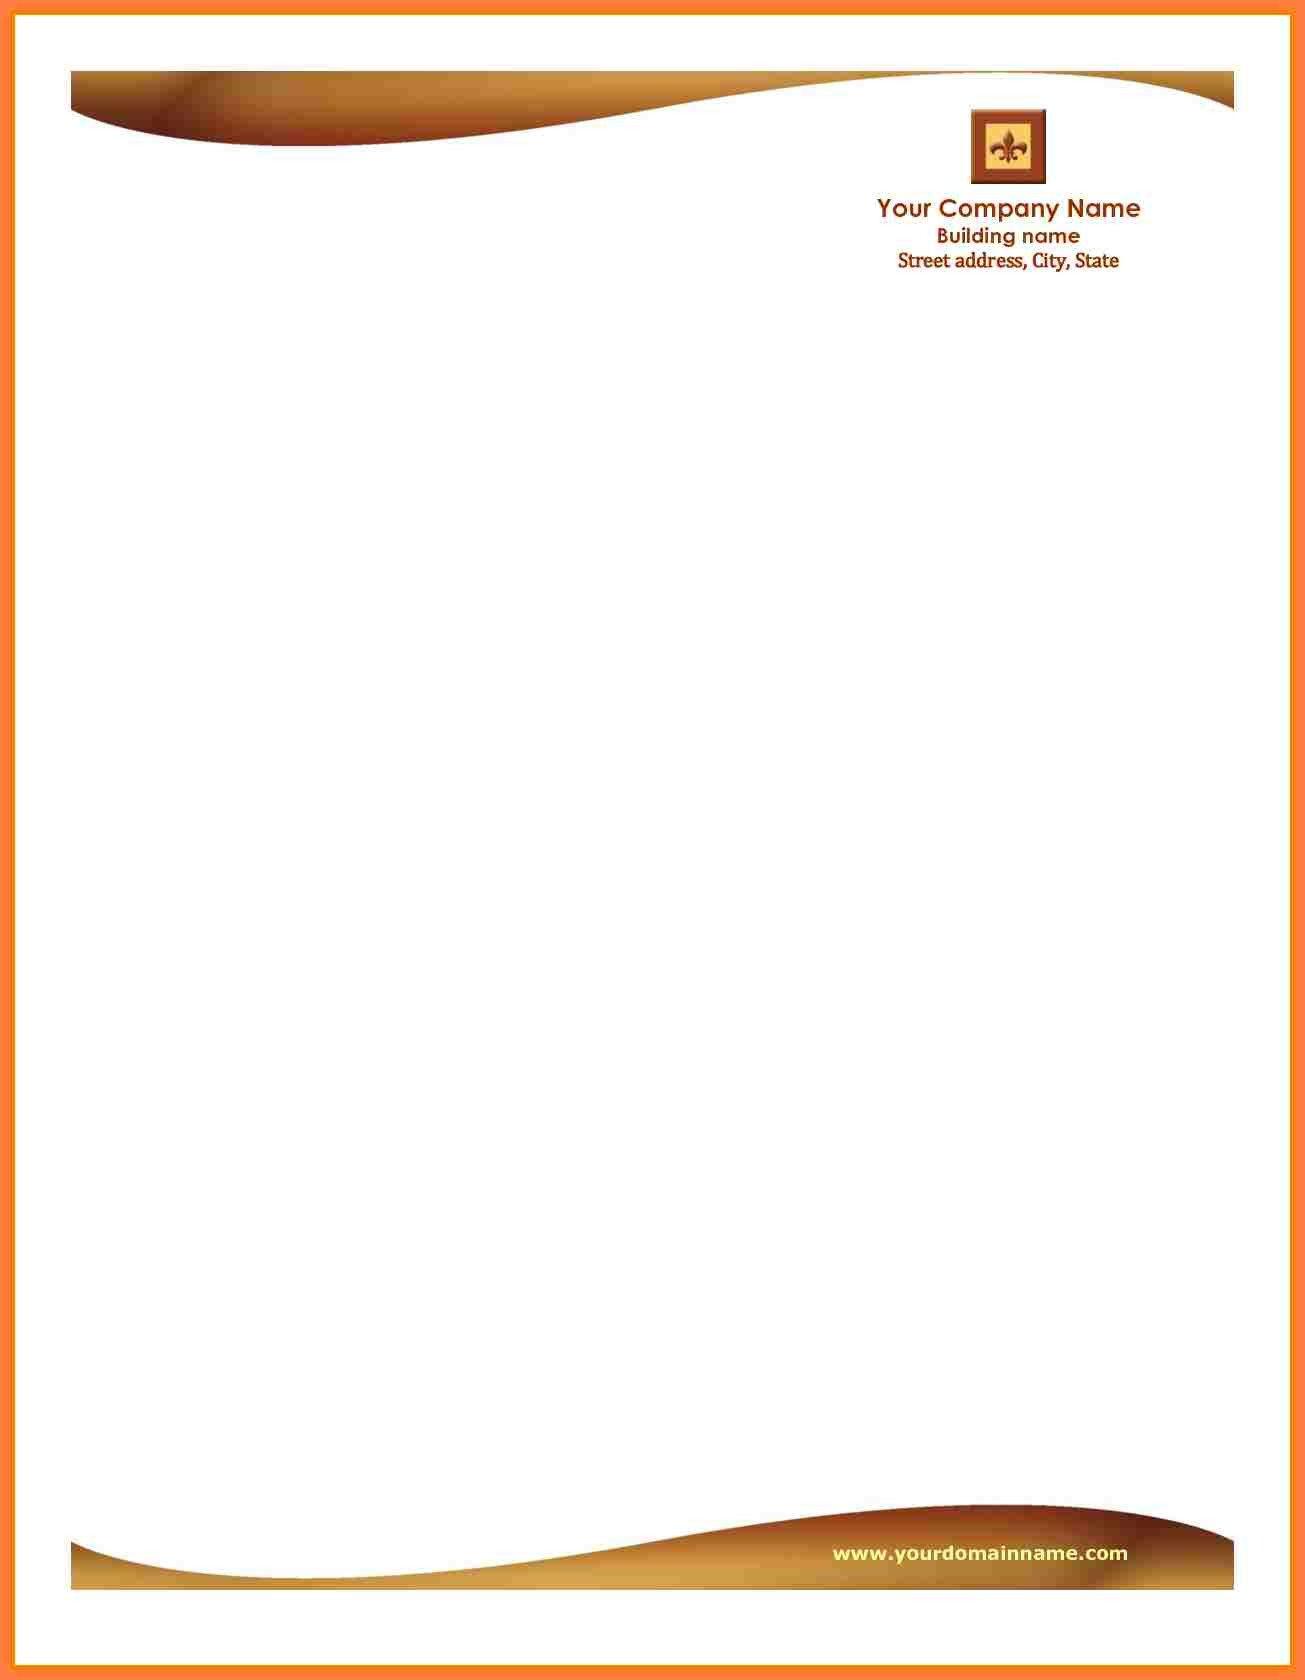 Free Company Letterhead Template 5 Letterhead Templates